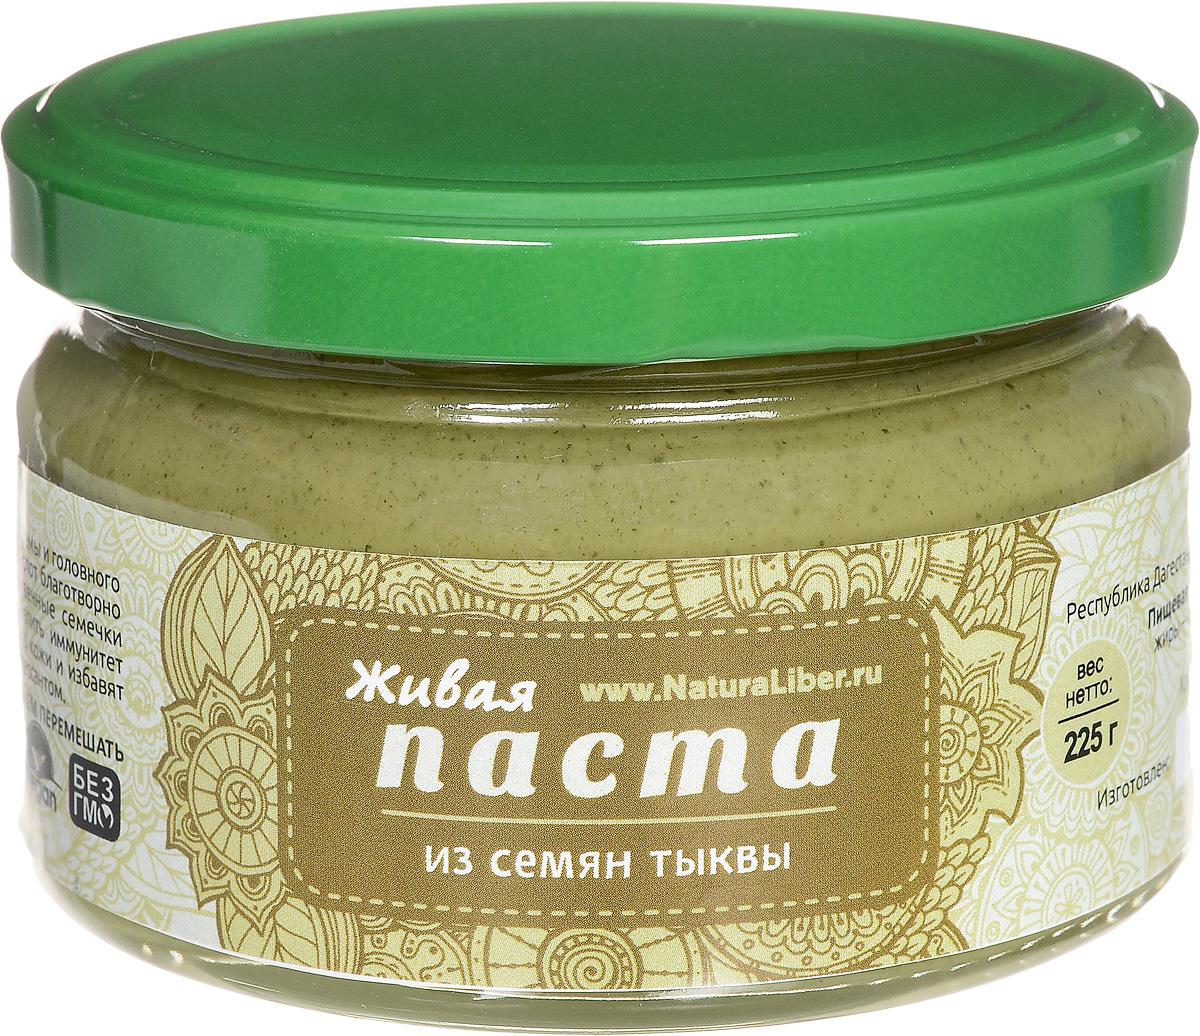 NaturaLiber паста из семян тыквы, 225 г 00-00000136_225 г